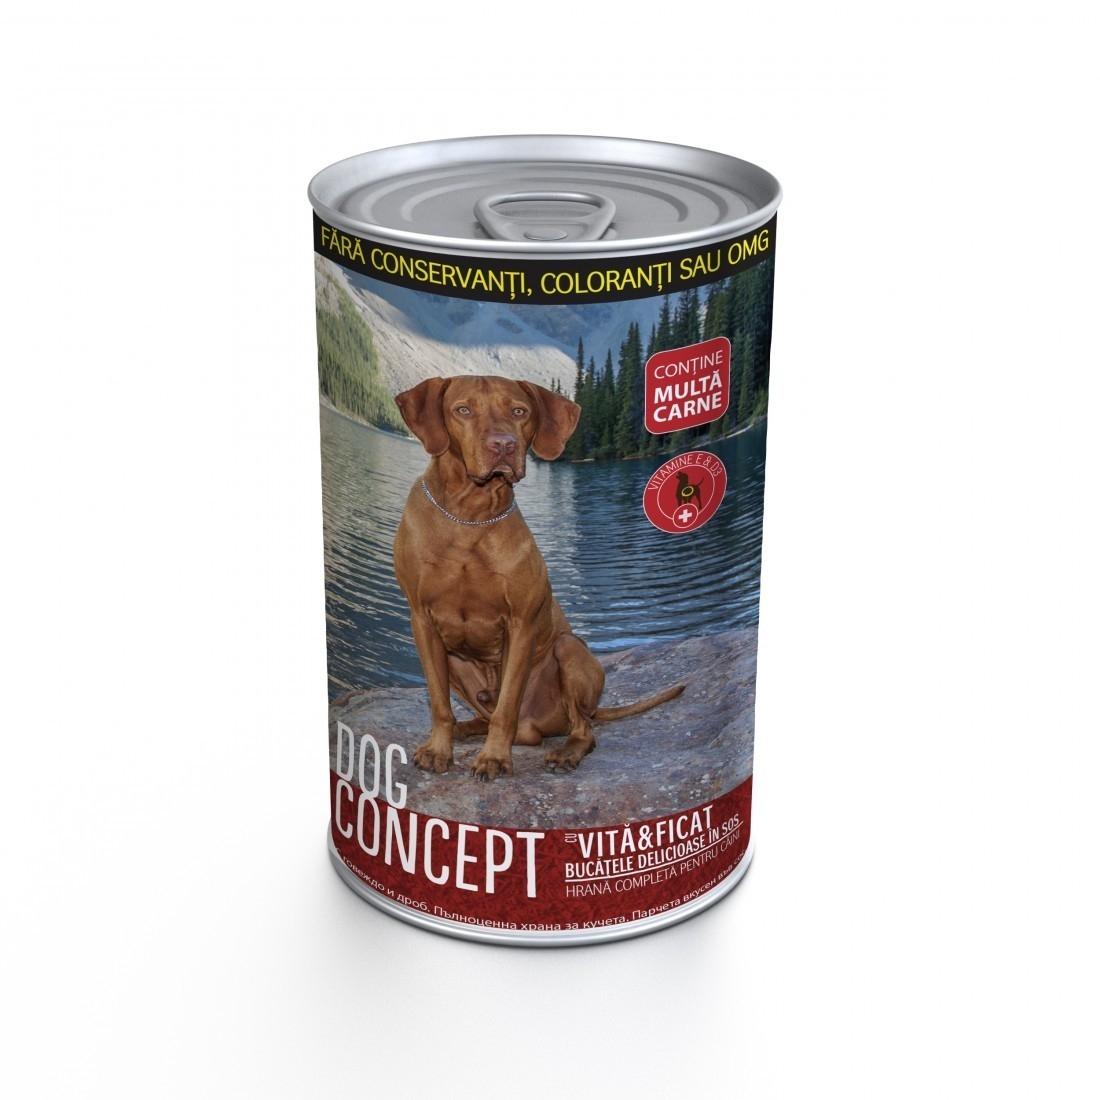 Dog Concept Conserva Vita Si Ficat, 1.24 Kg